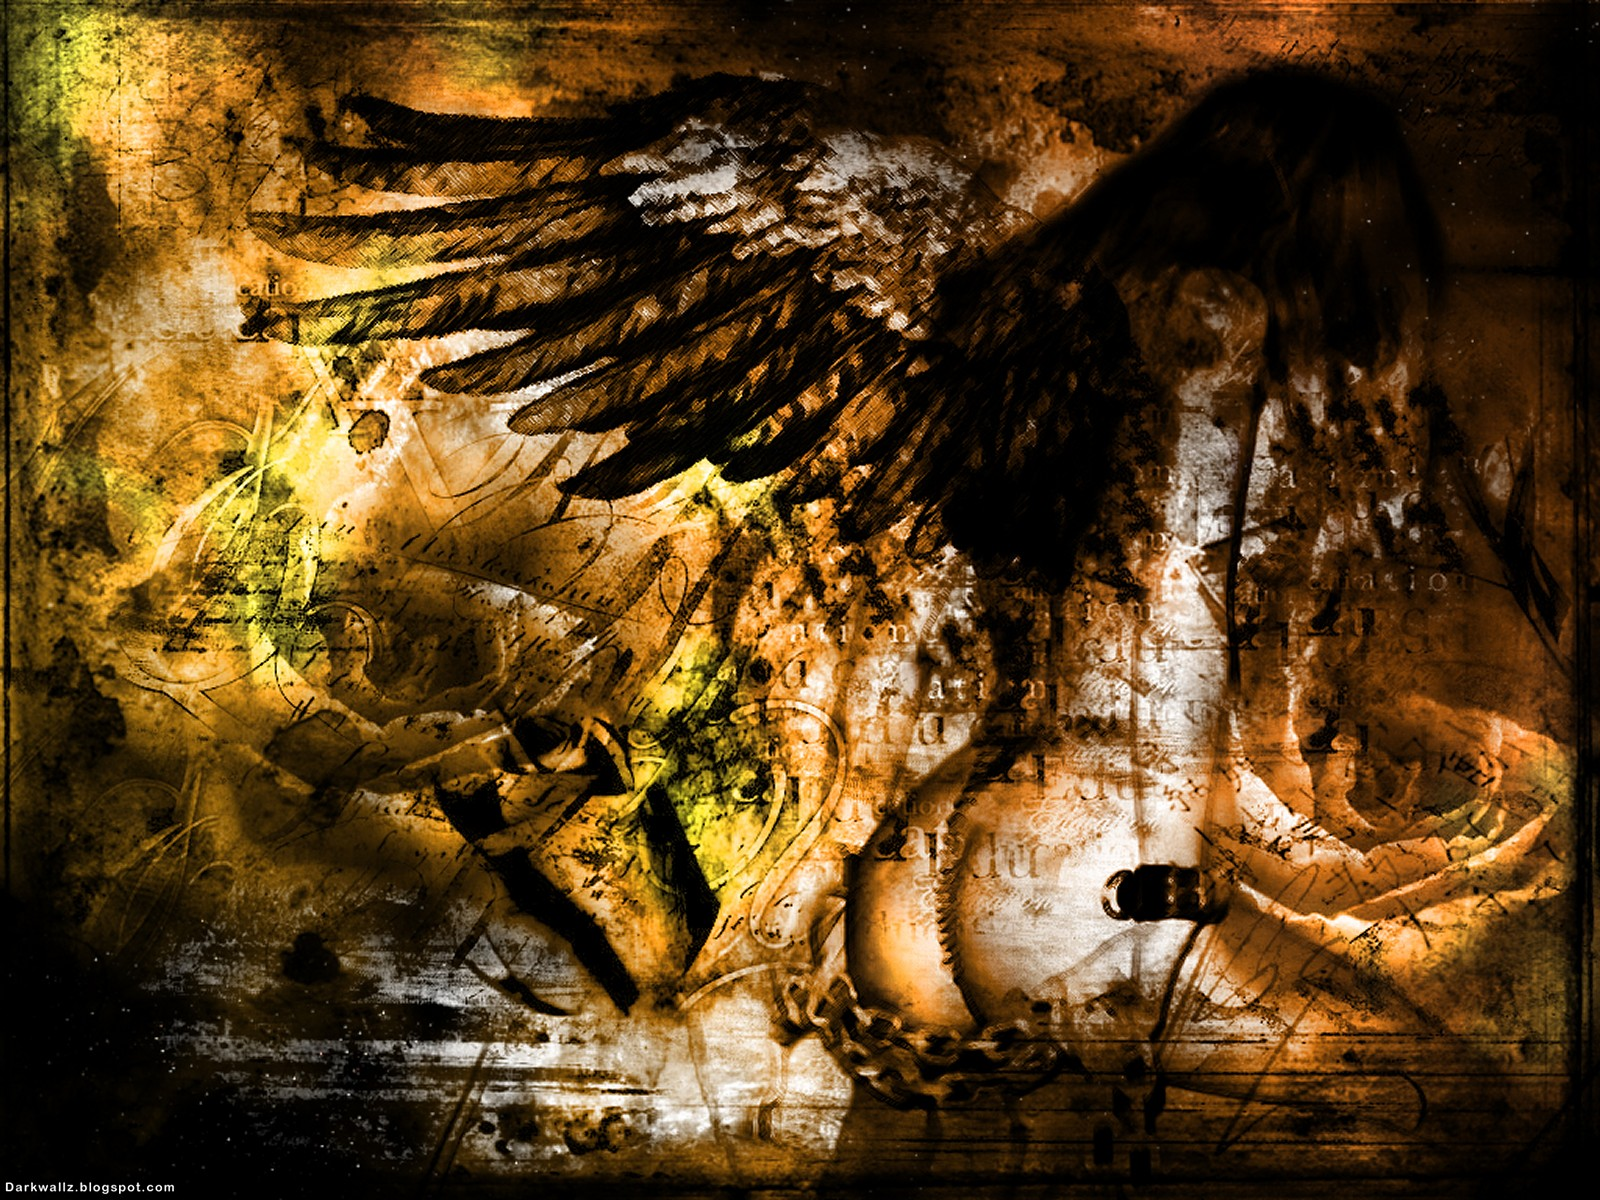 http://2.bp.blogspot.com/_-jo2ZCYhKaY/S62hmPrSkVI/AAAAAAAAHP8/eL-9DPE2BmA/s1600/Dark_Angel_Wallpapers_52%20(darkwallz.blogspot.com).jpg